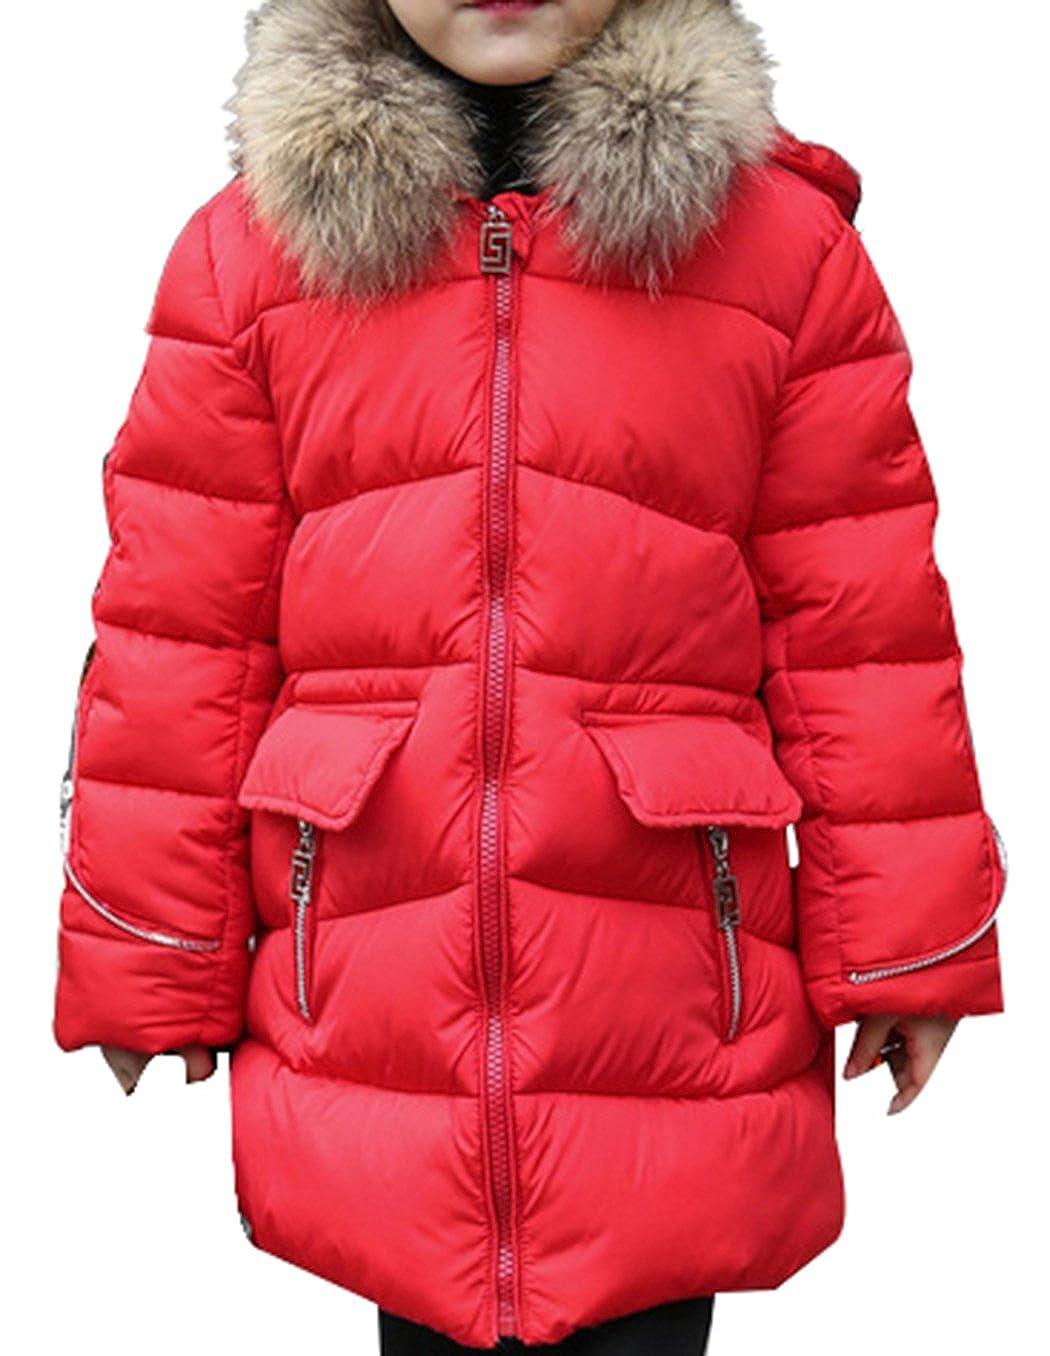 JiaYou Girl Child Kid Lovely Faux Fur Hooded Zip Warm Winter Coat USGA037